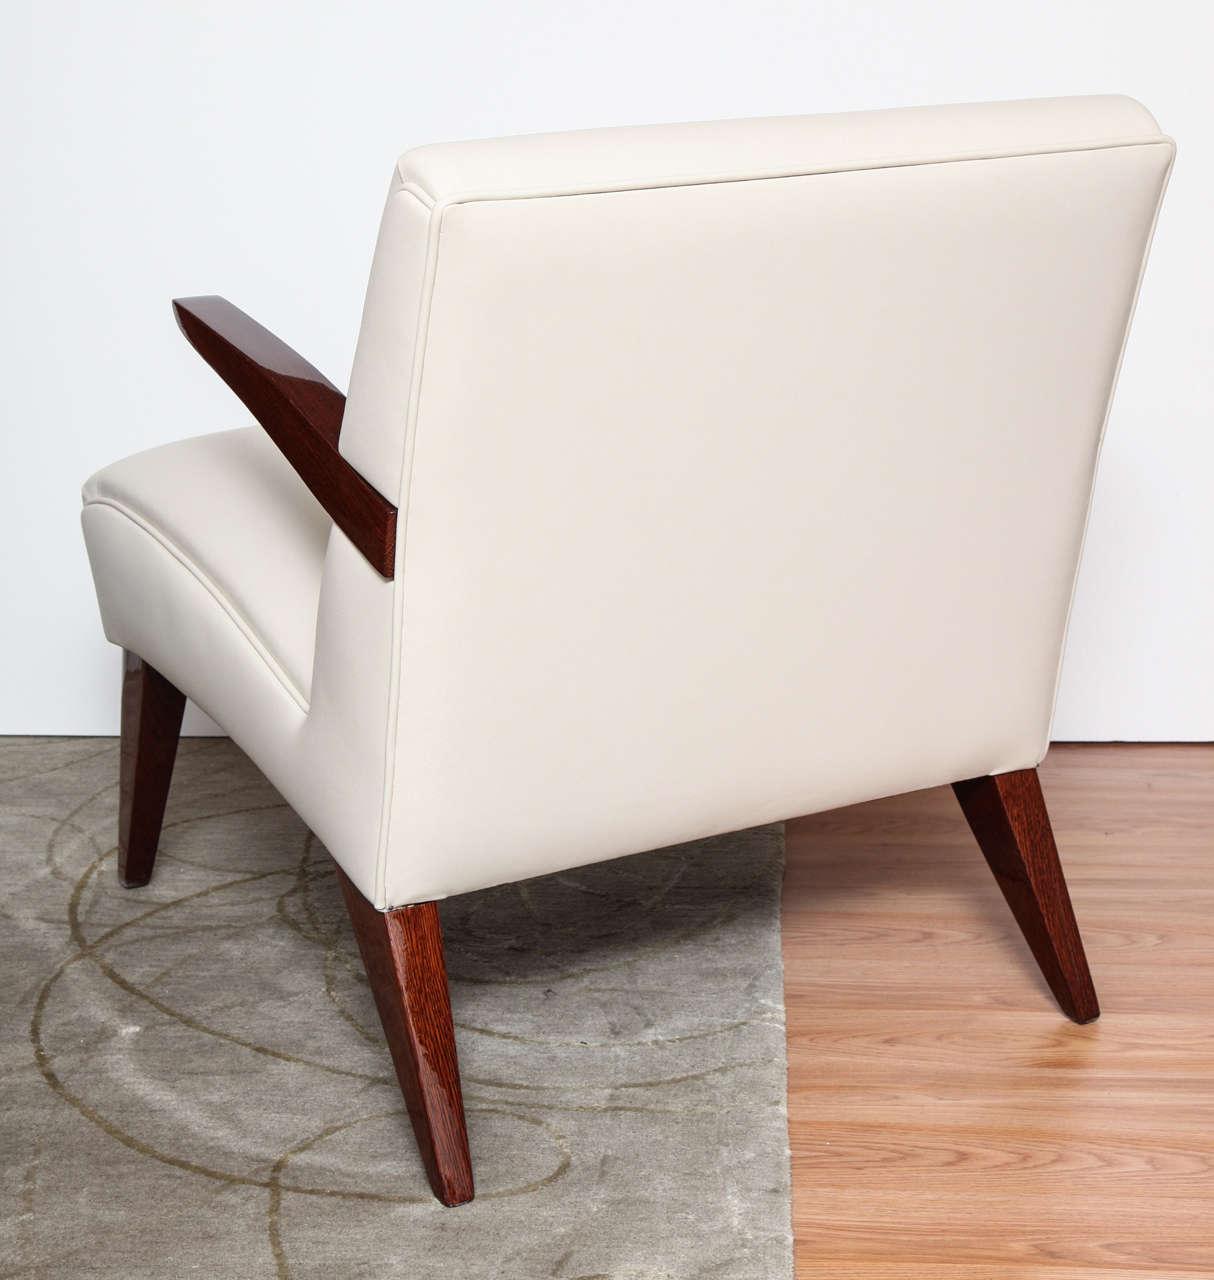 Pair of Art Deco Streamline Lounge Chairs 6